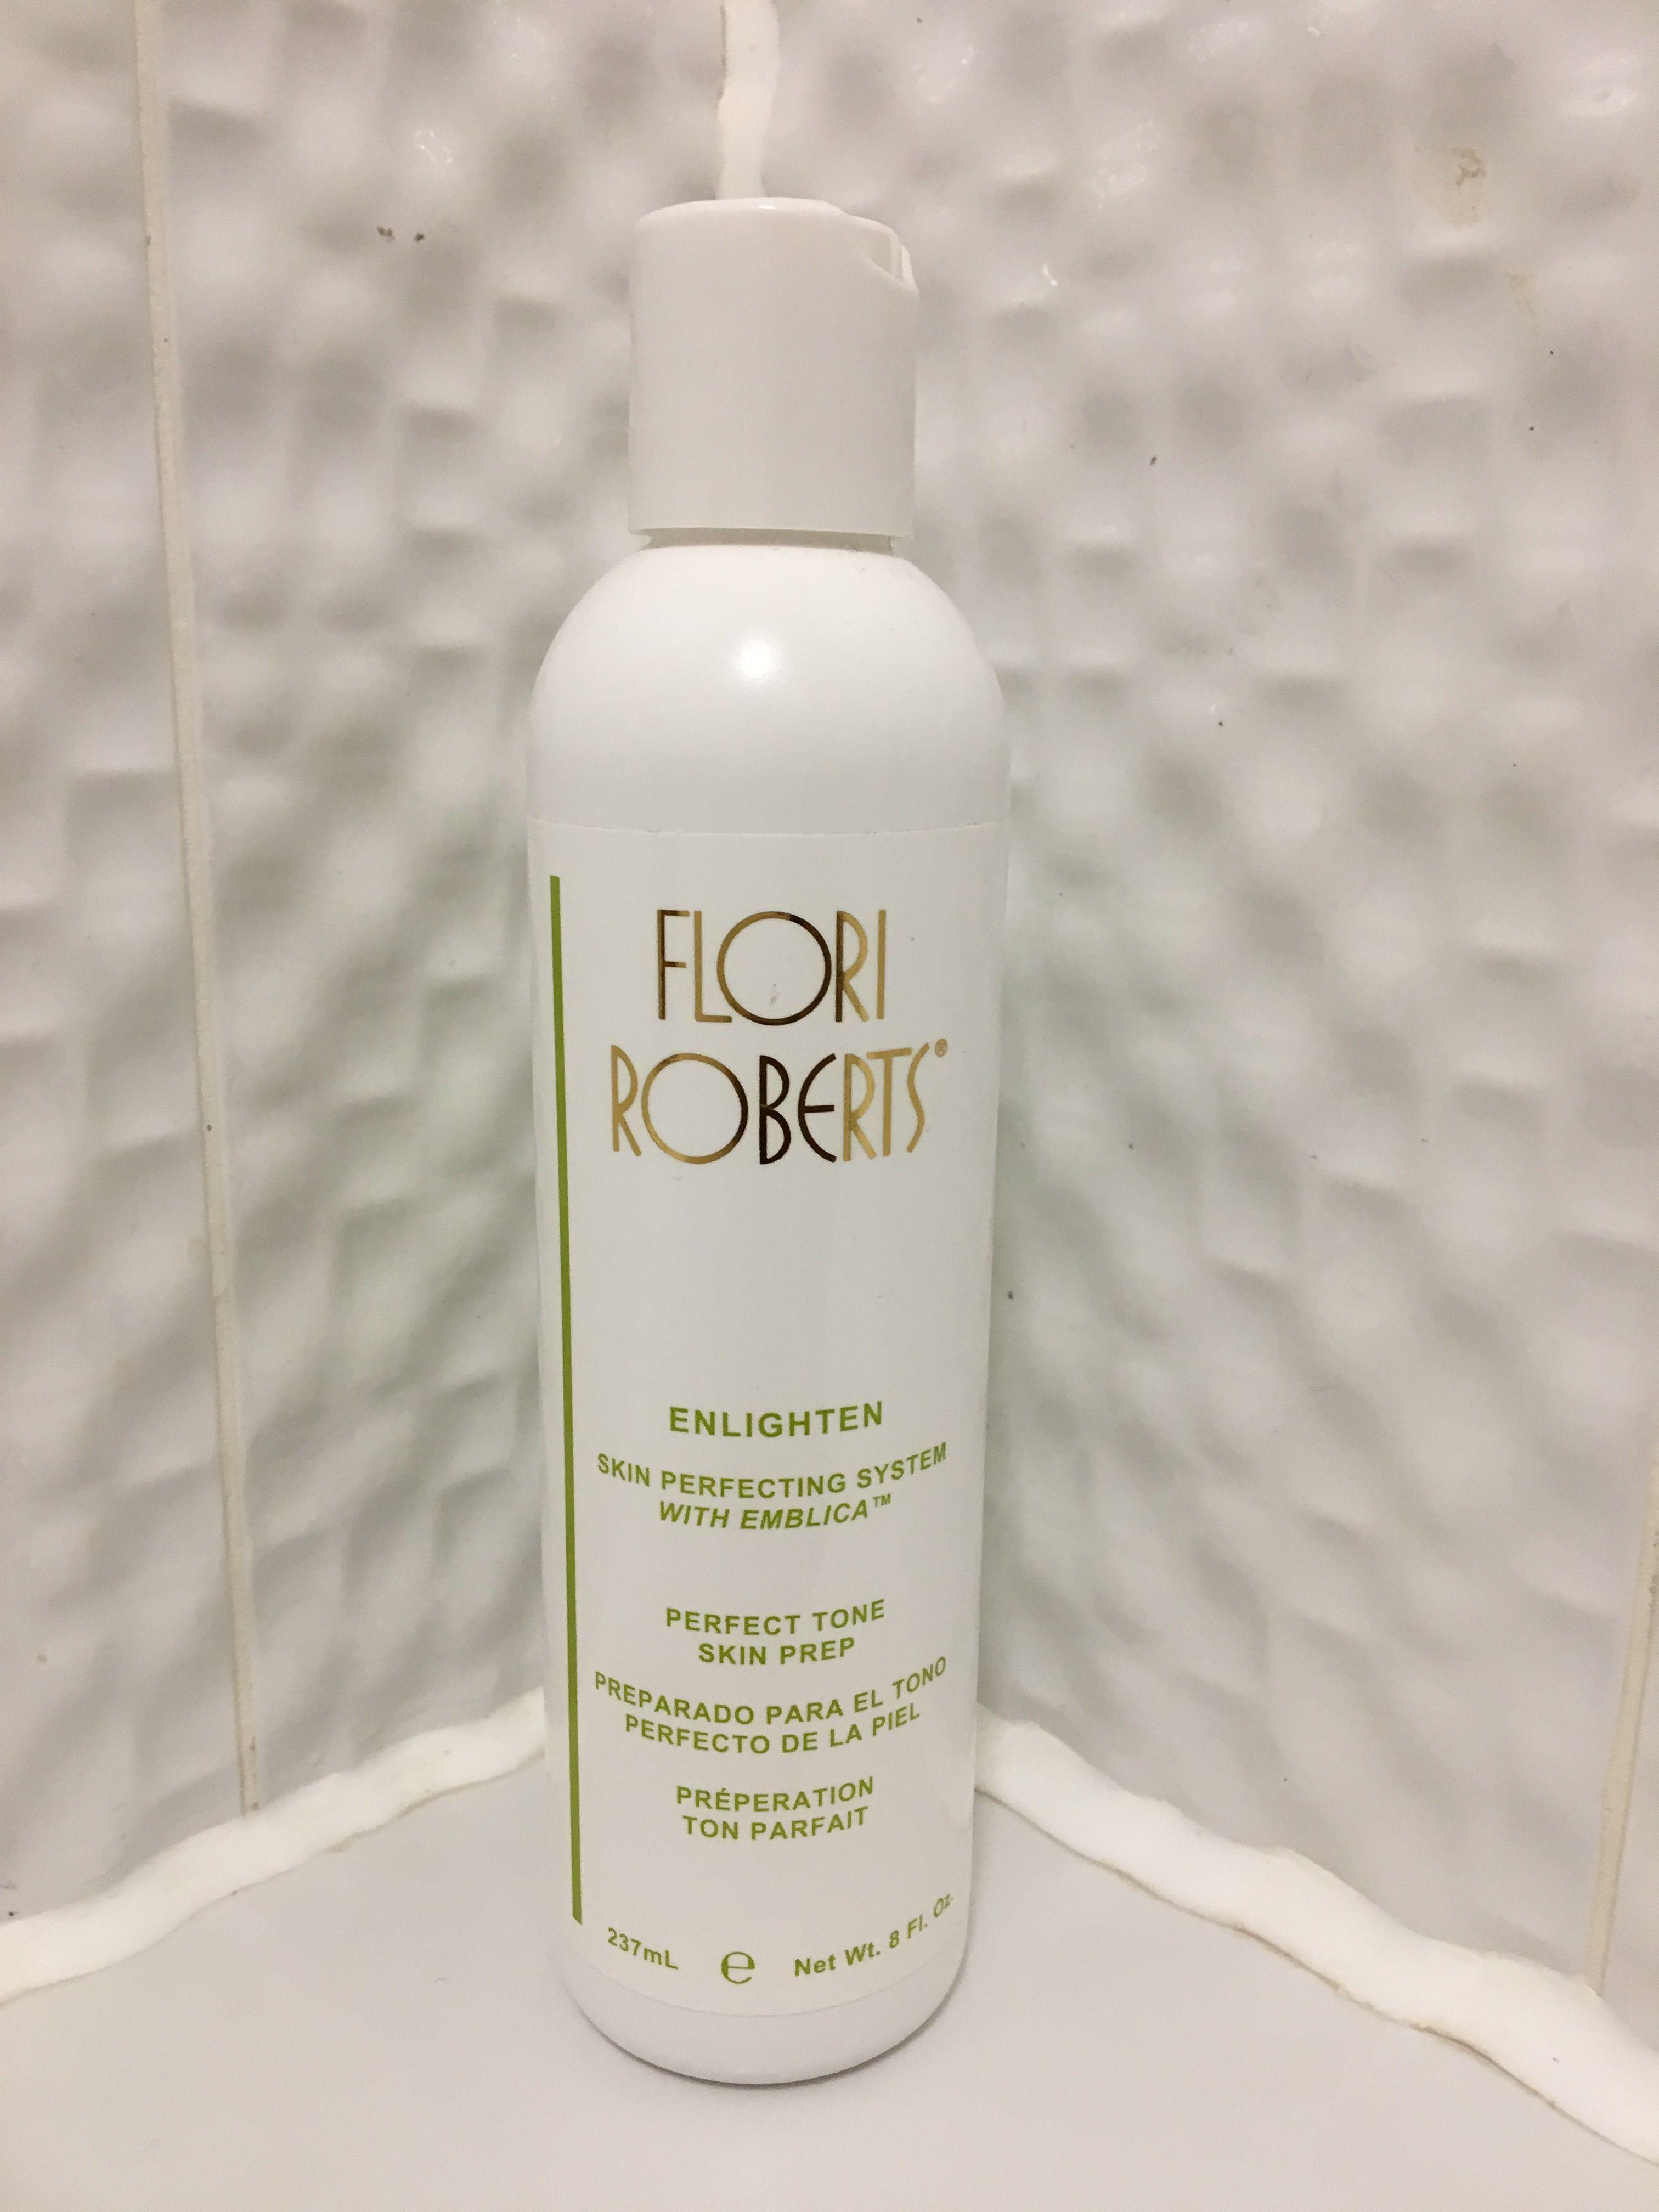 U.K. Flori Roberts Skincare £15.90 Fresh skincare, Skin